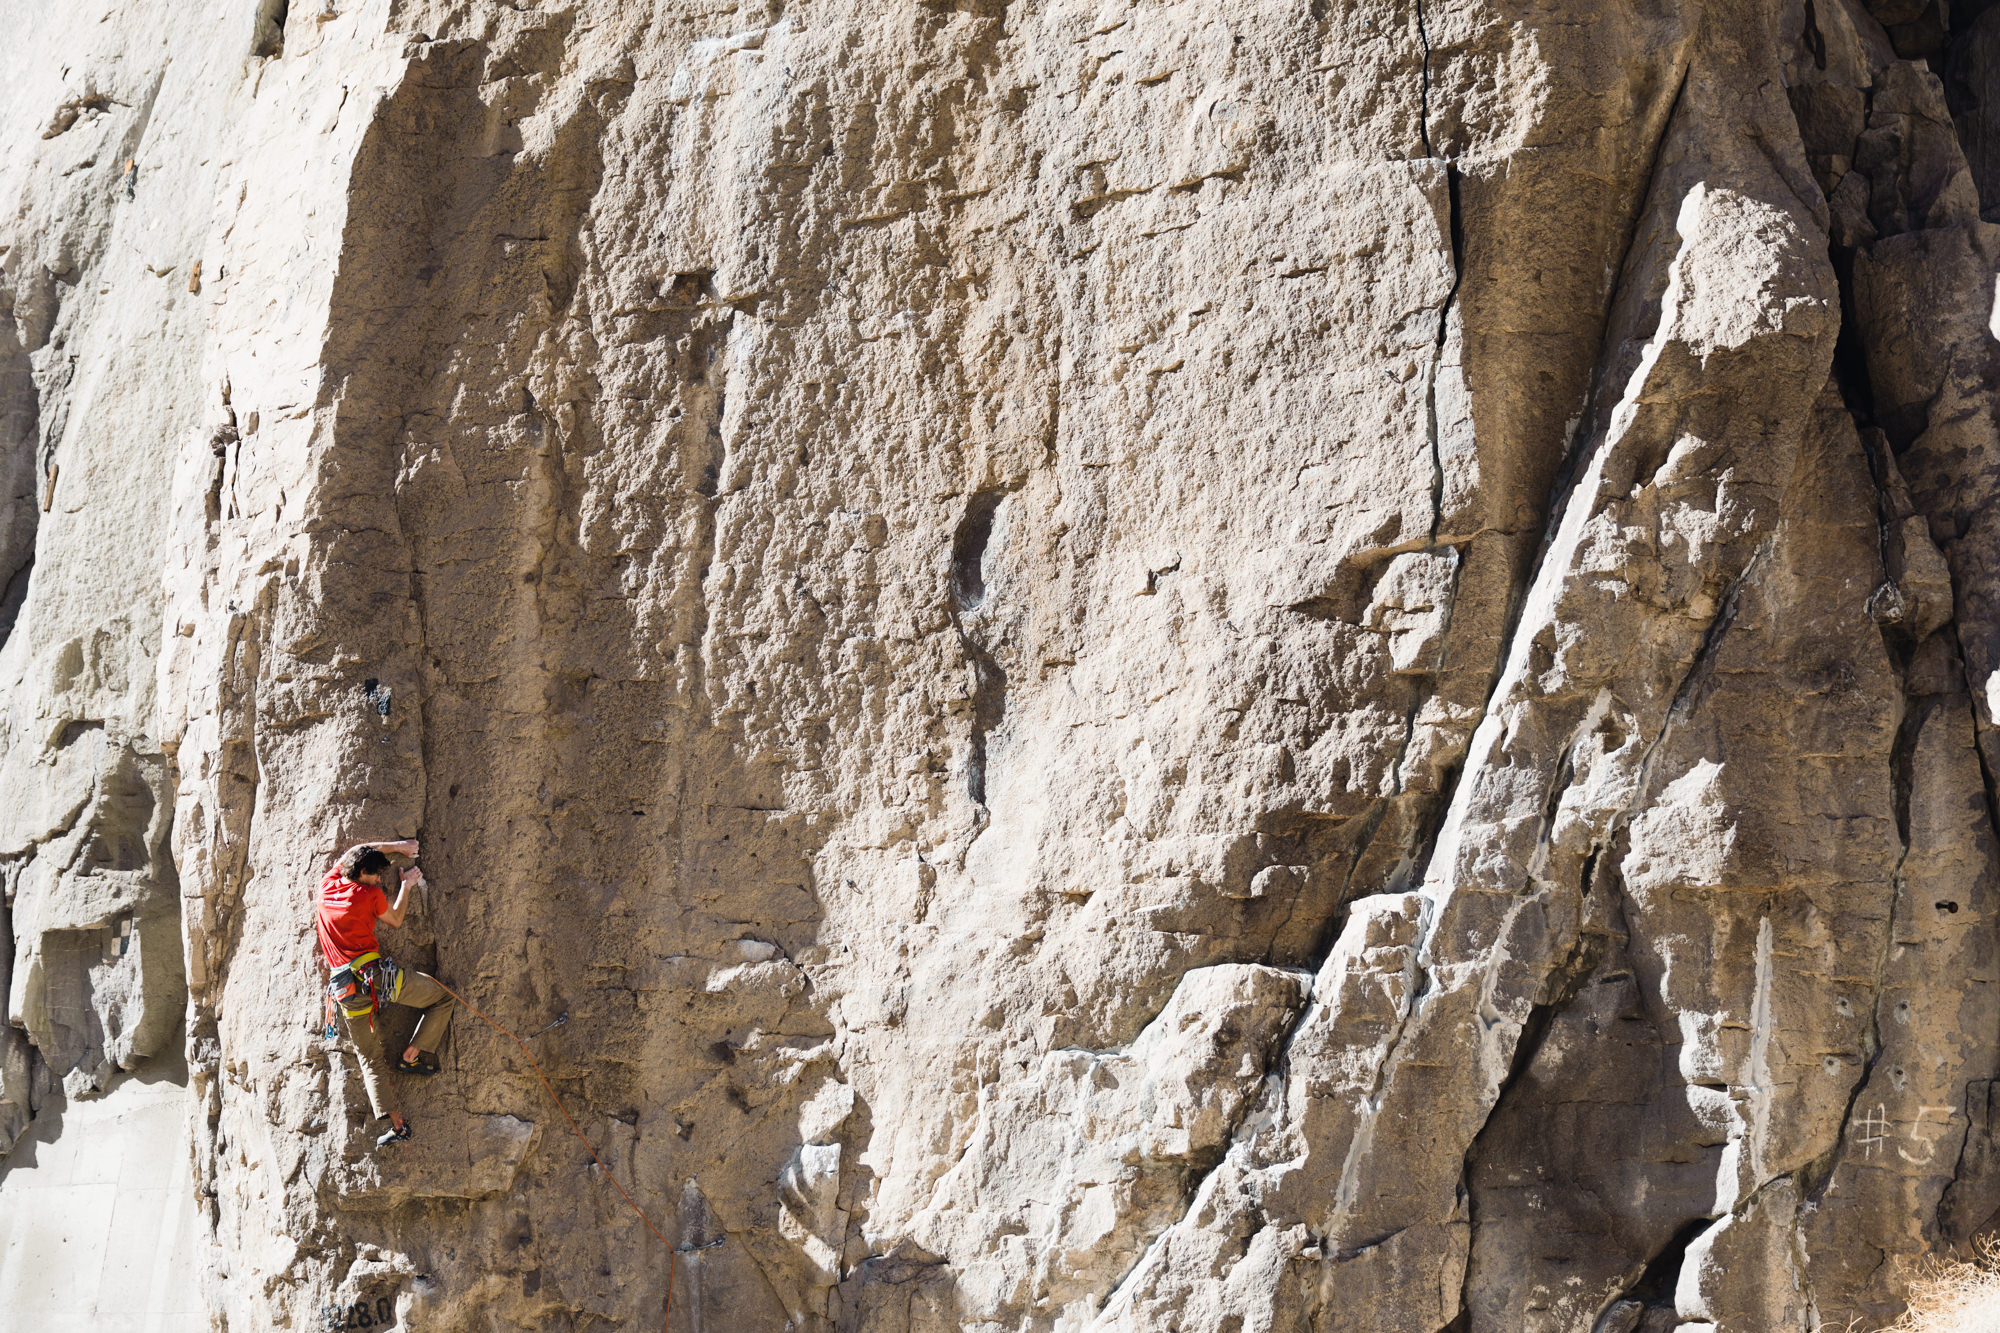 rock-climbing-photography-8.jpg